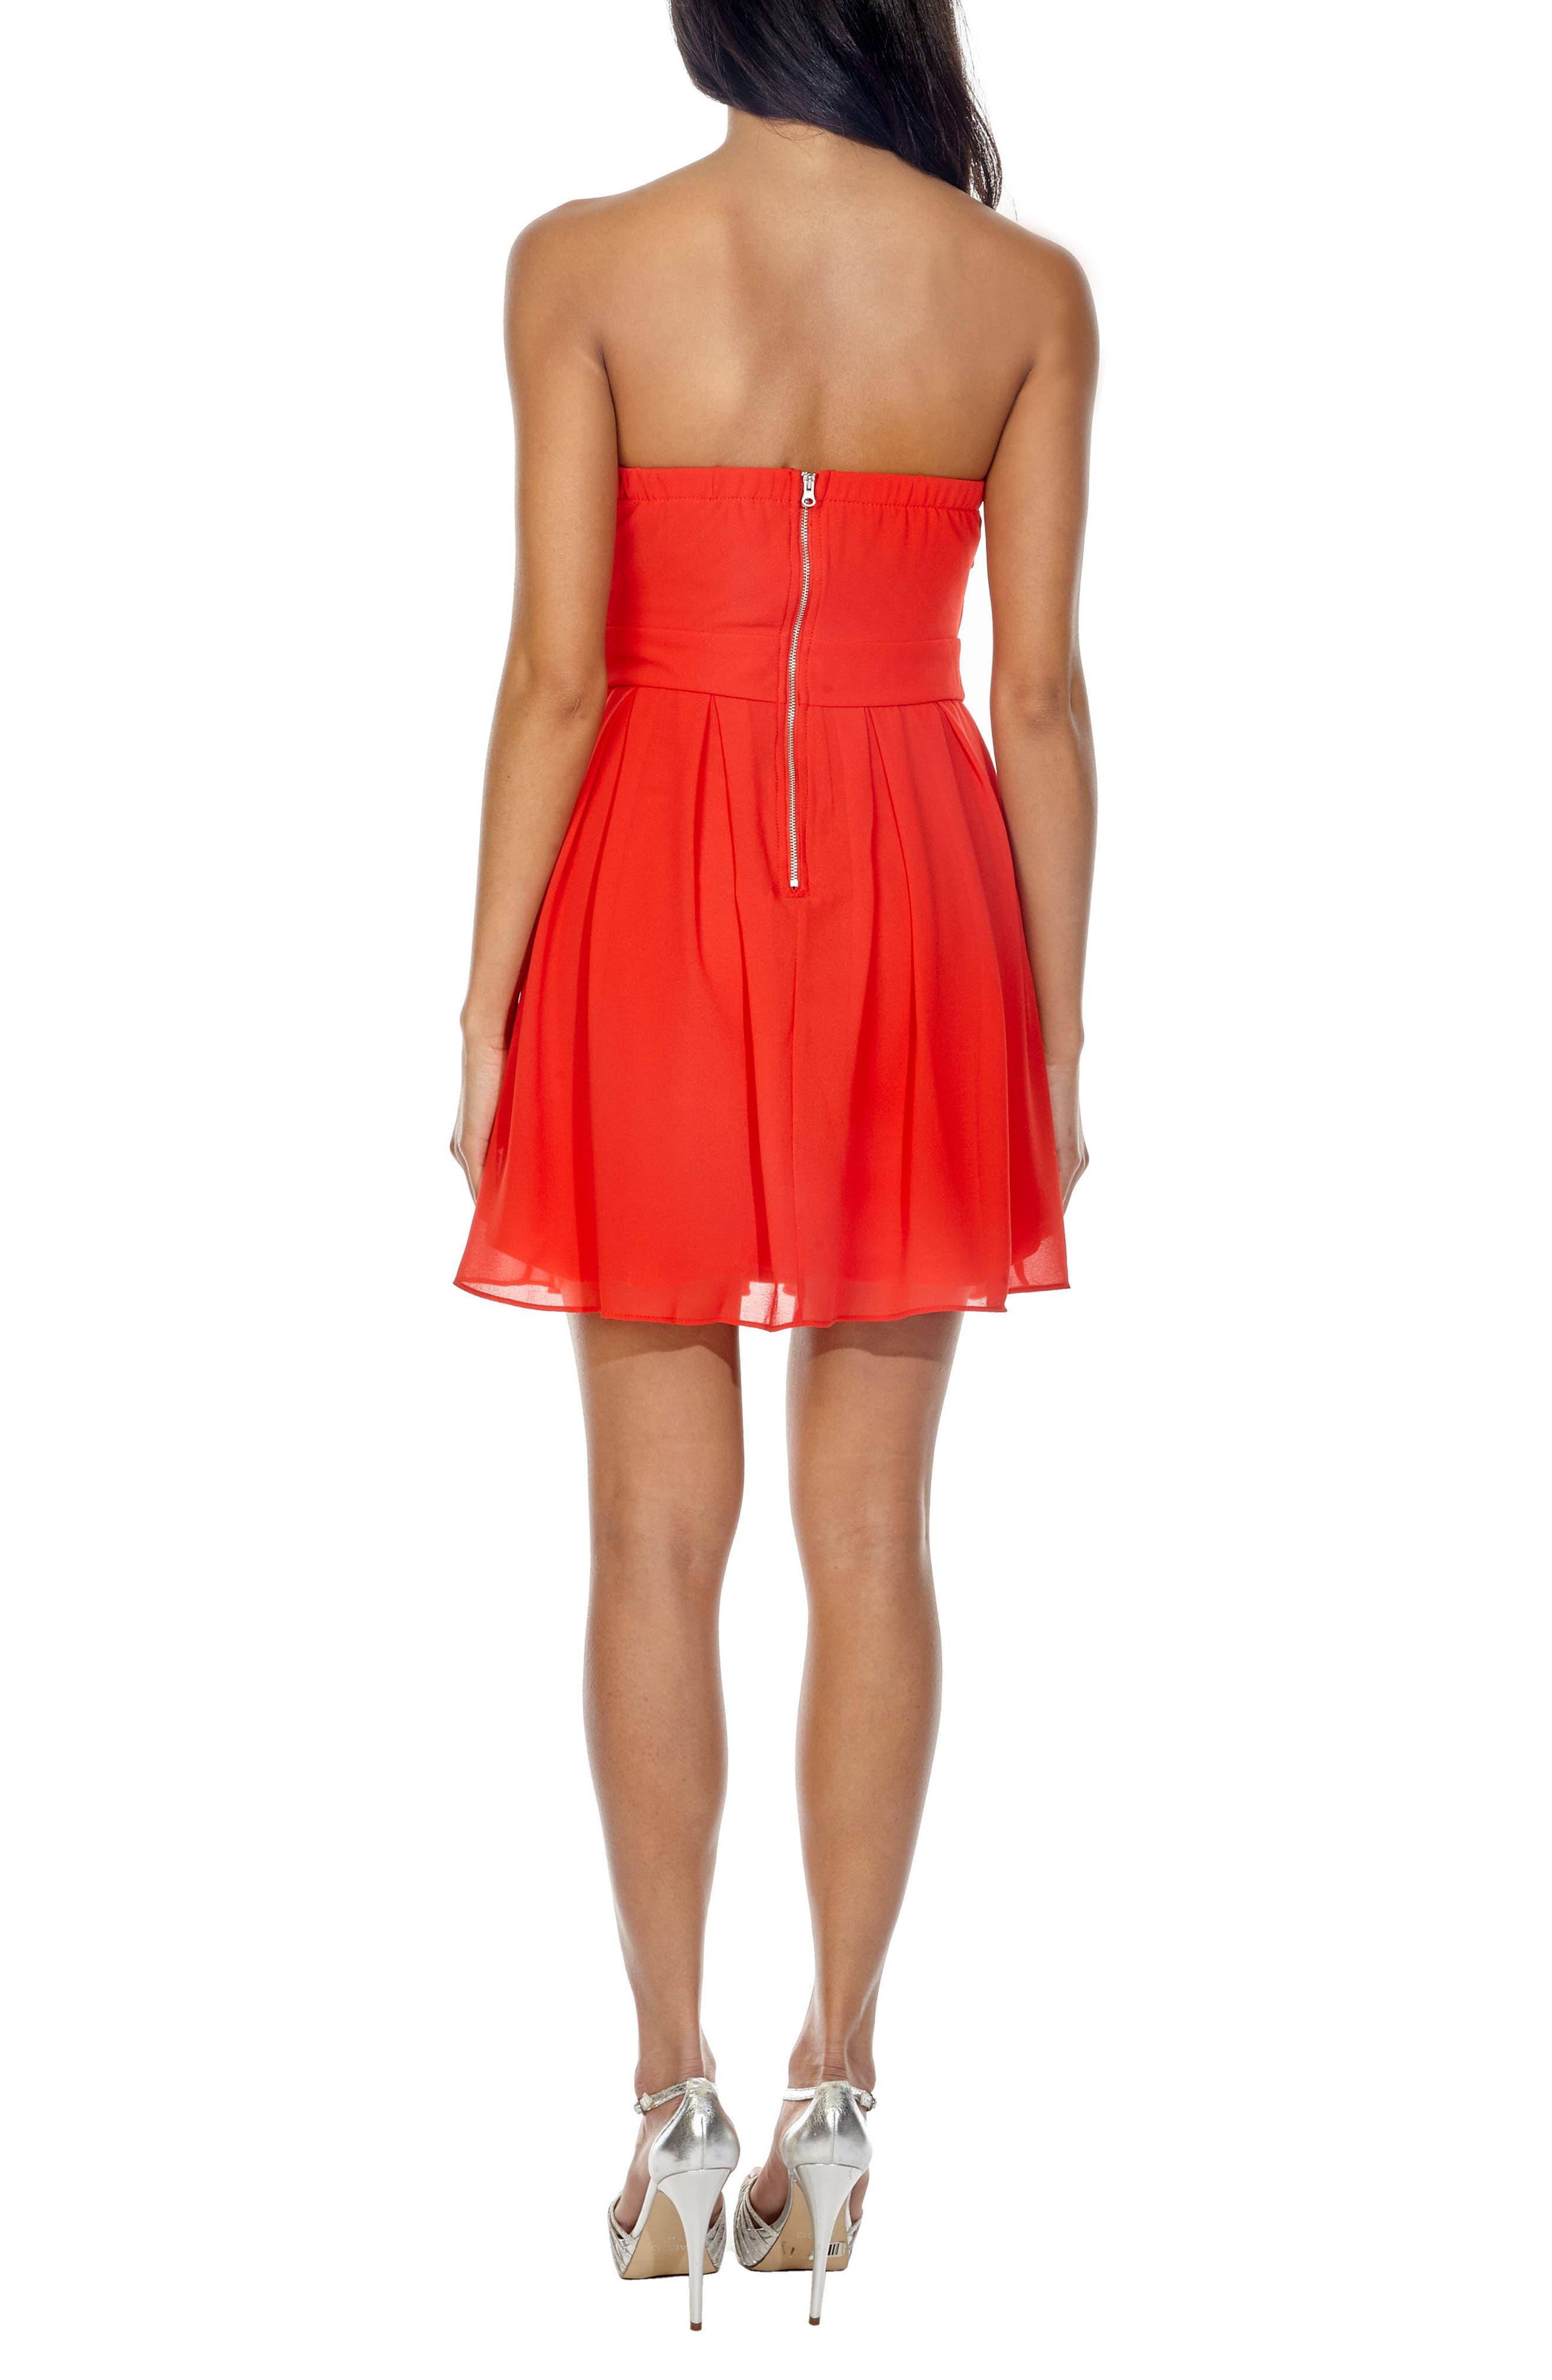 Elida Pleat Skirt Strapless Fit & Flare Dress,                             Alternate thumbnail 2, color,                             Red